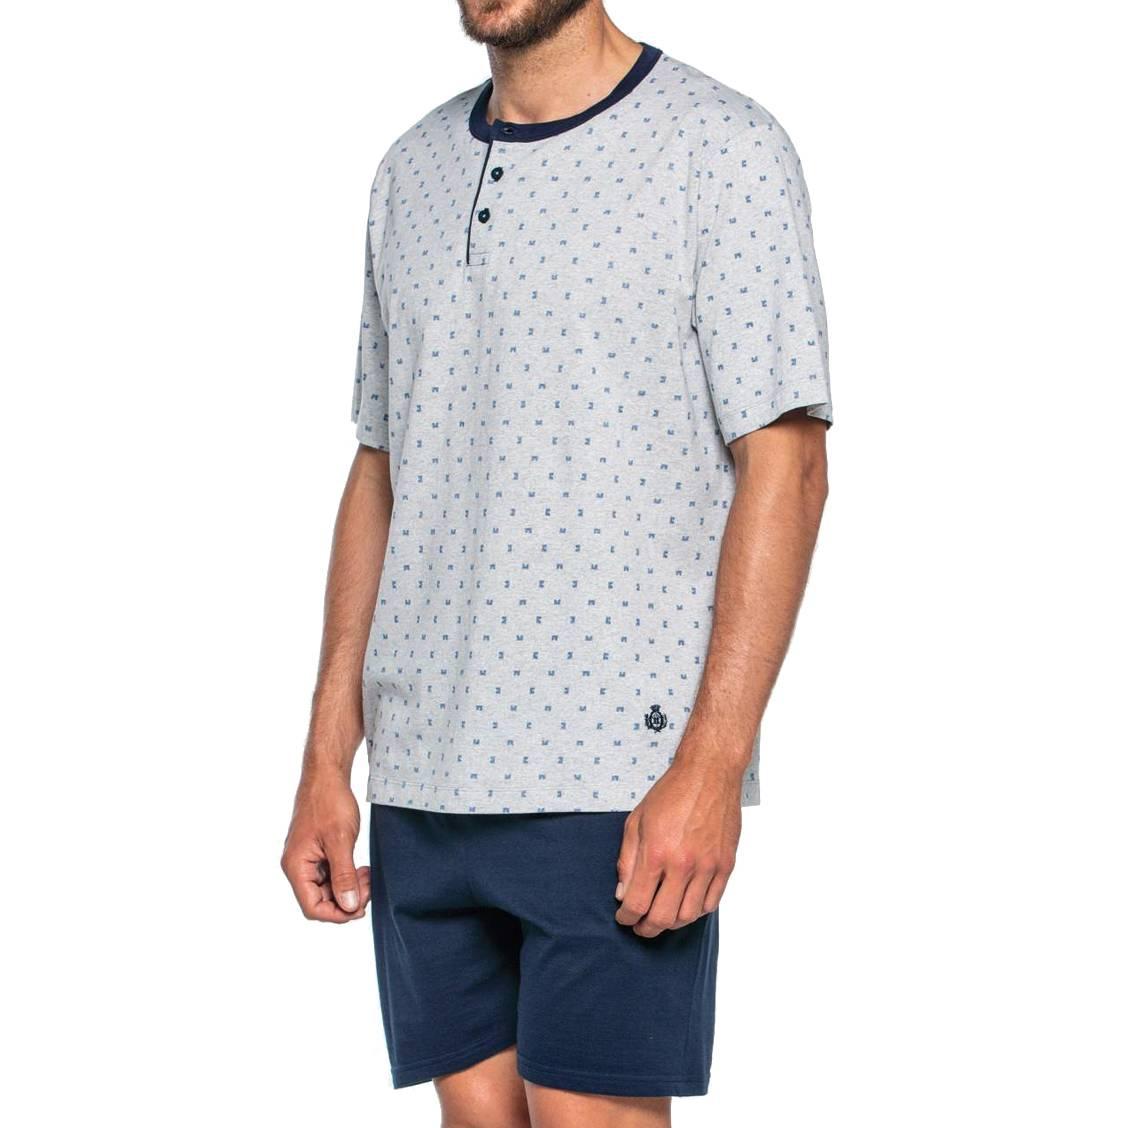 Pyjama court Guasch en coton : tee-shirt col tunisien gris à motifs bleus et short bleu marine